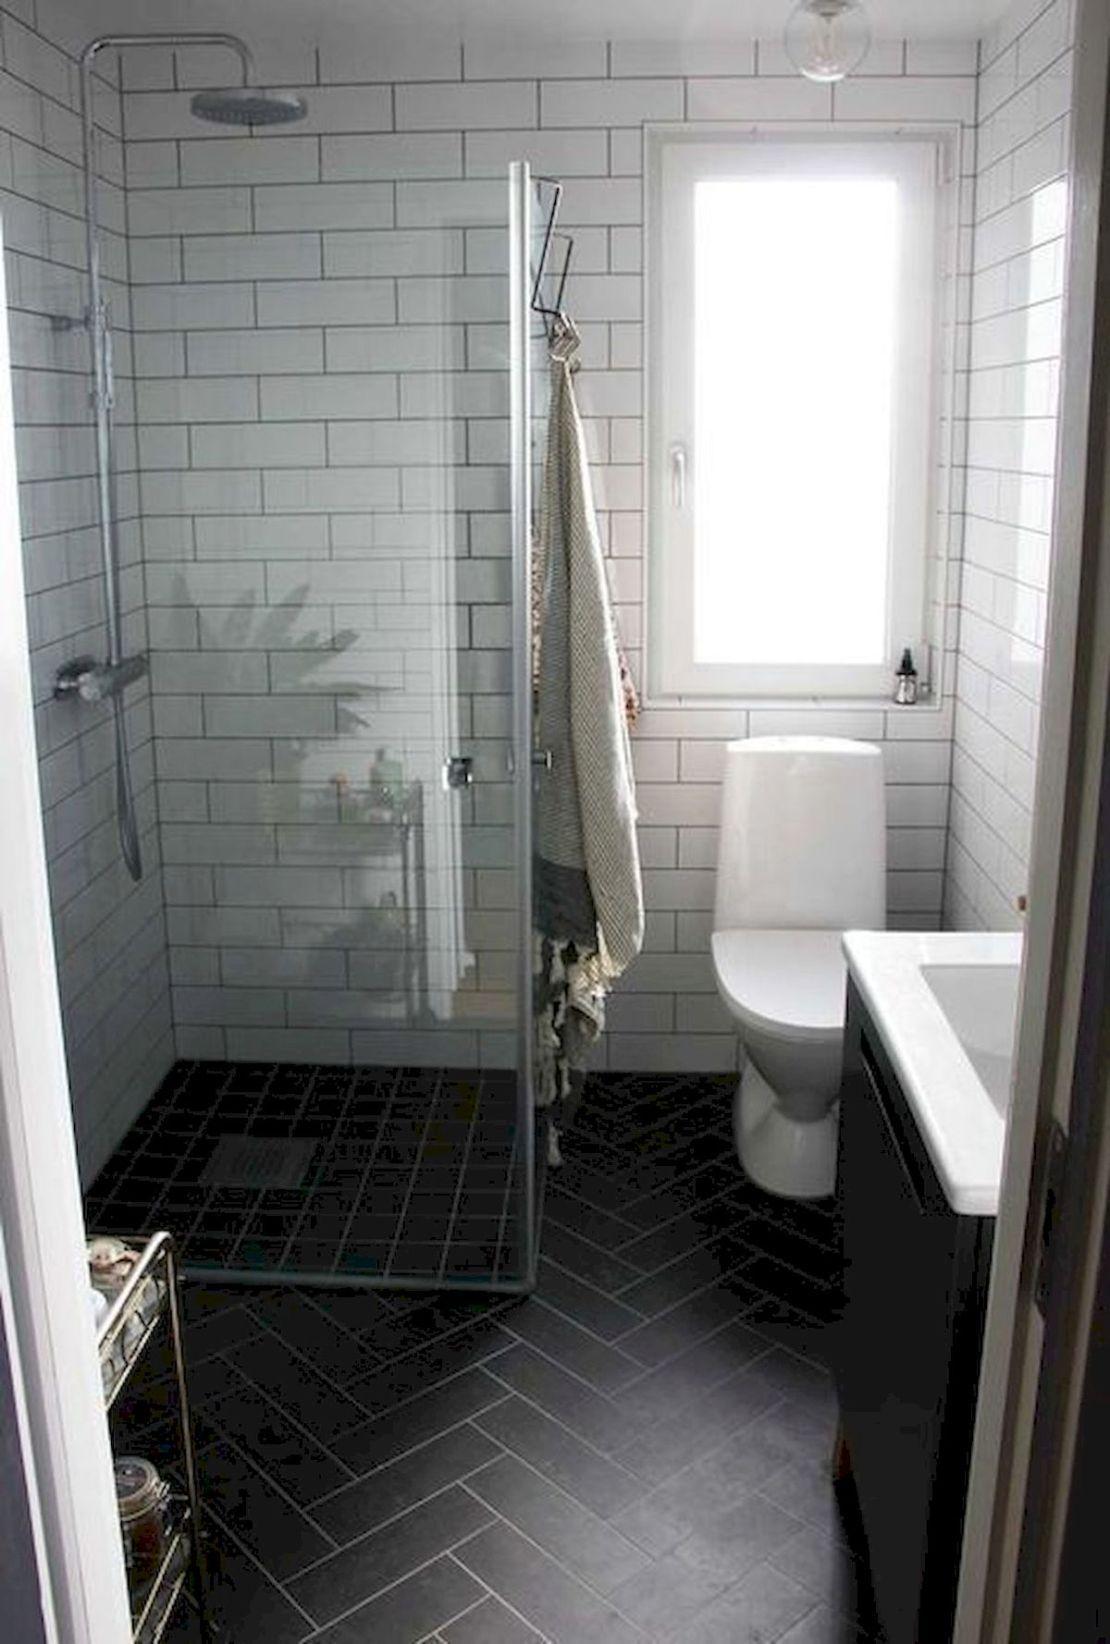 Stunning Small Bathroom Ideas On A Budget 20 Shairoom Com Bathroom Remodel Designs Simple Bathroom Small Master Bathroom